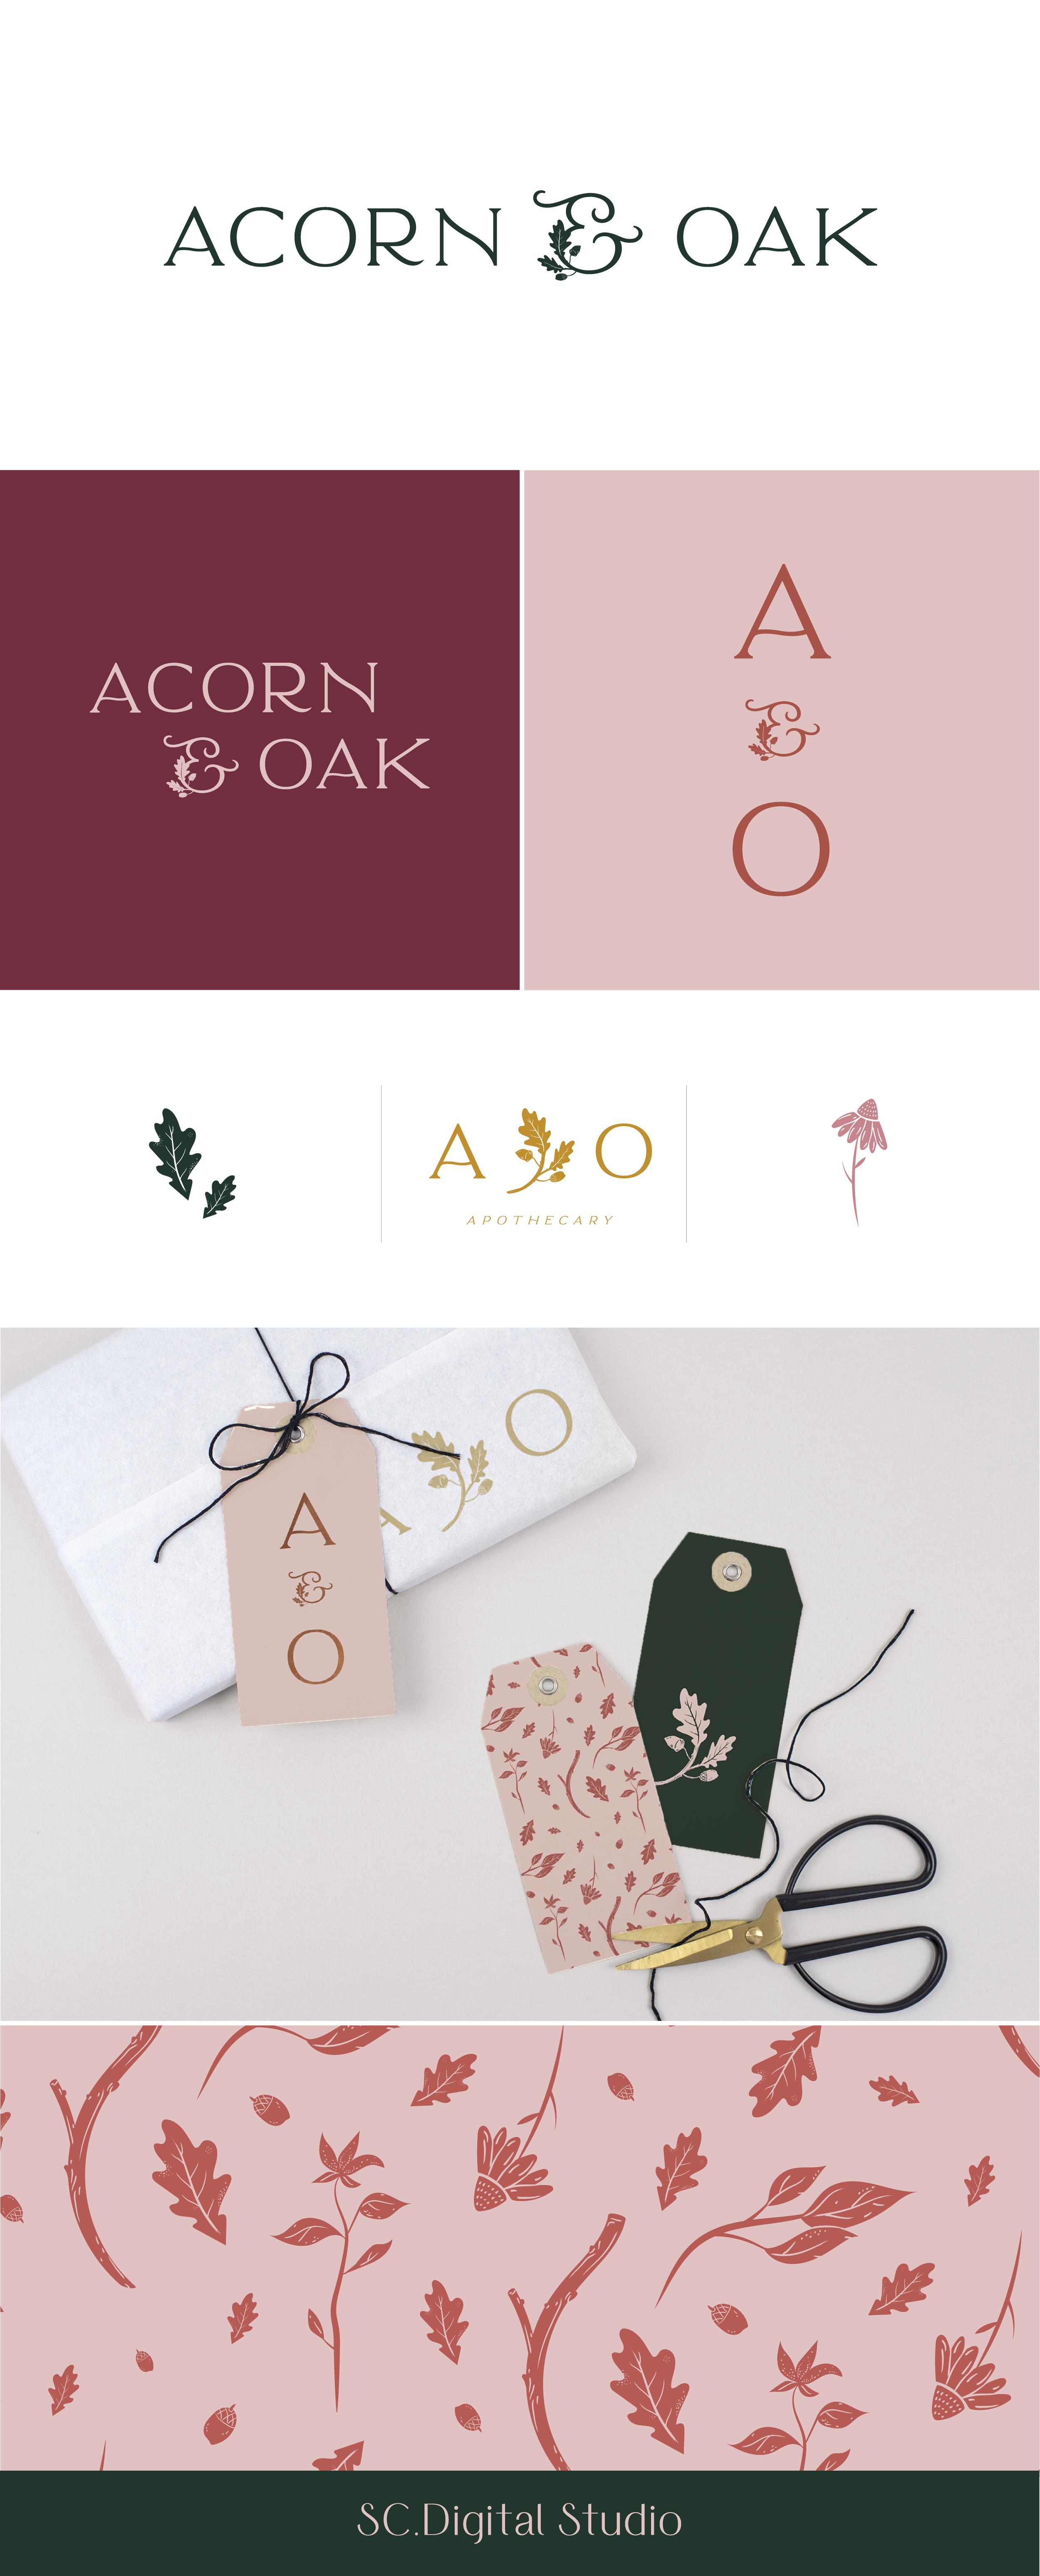 acorn&oak-branding-scdigital.png